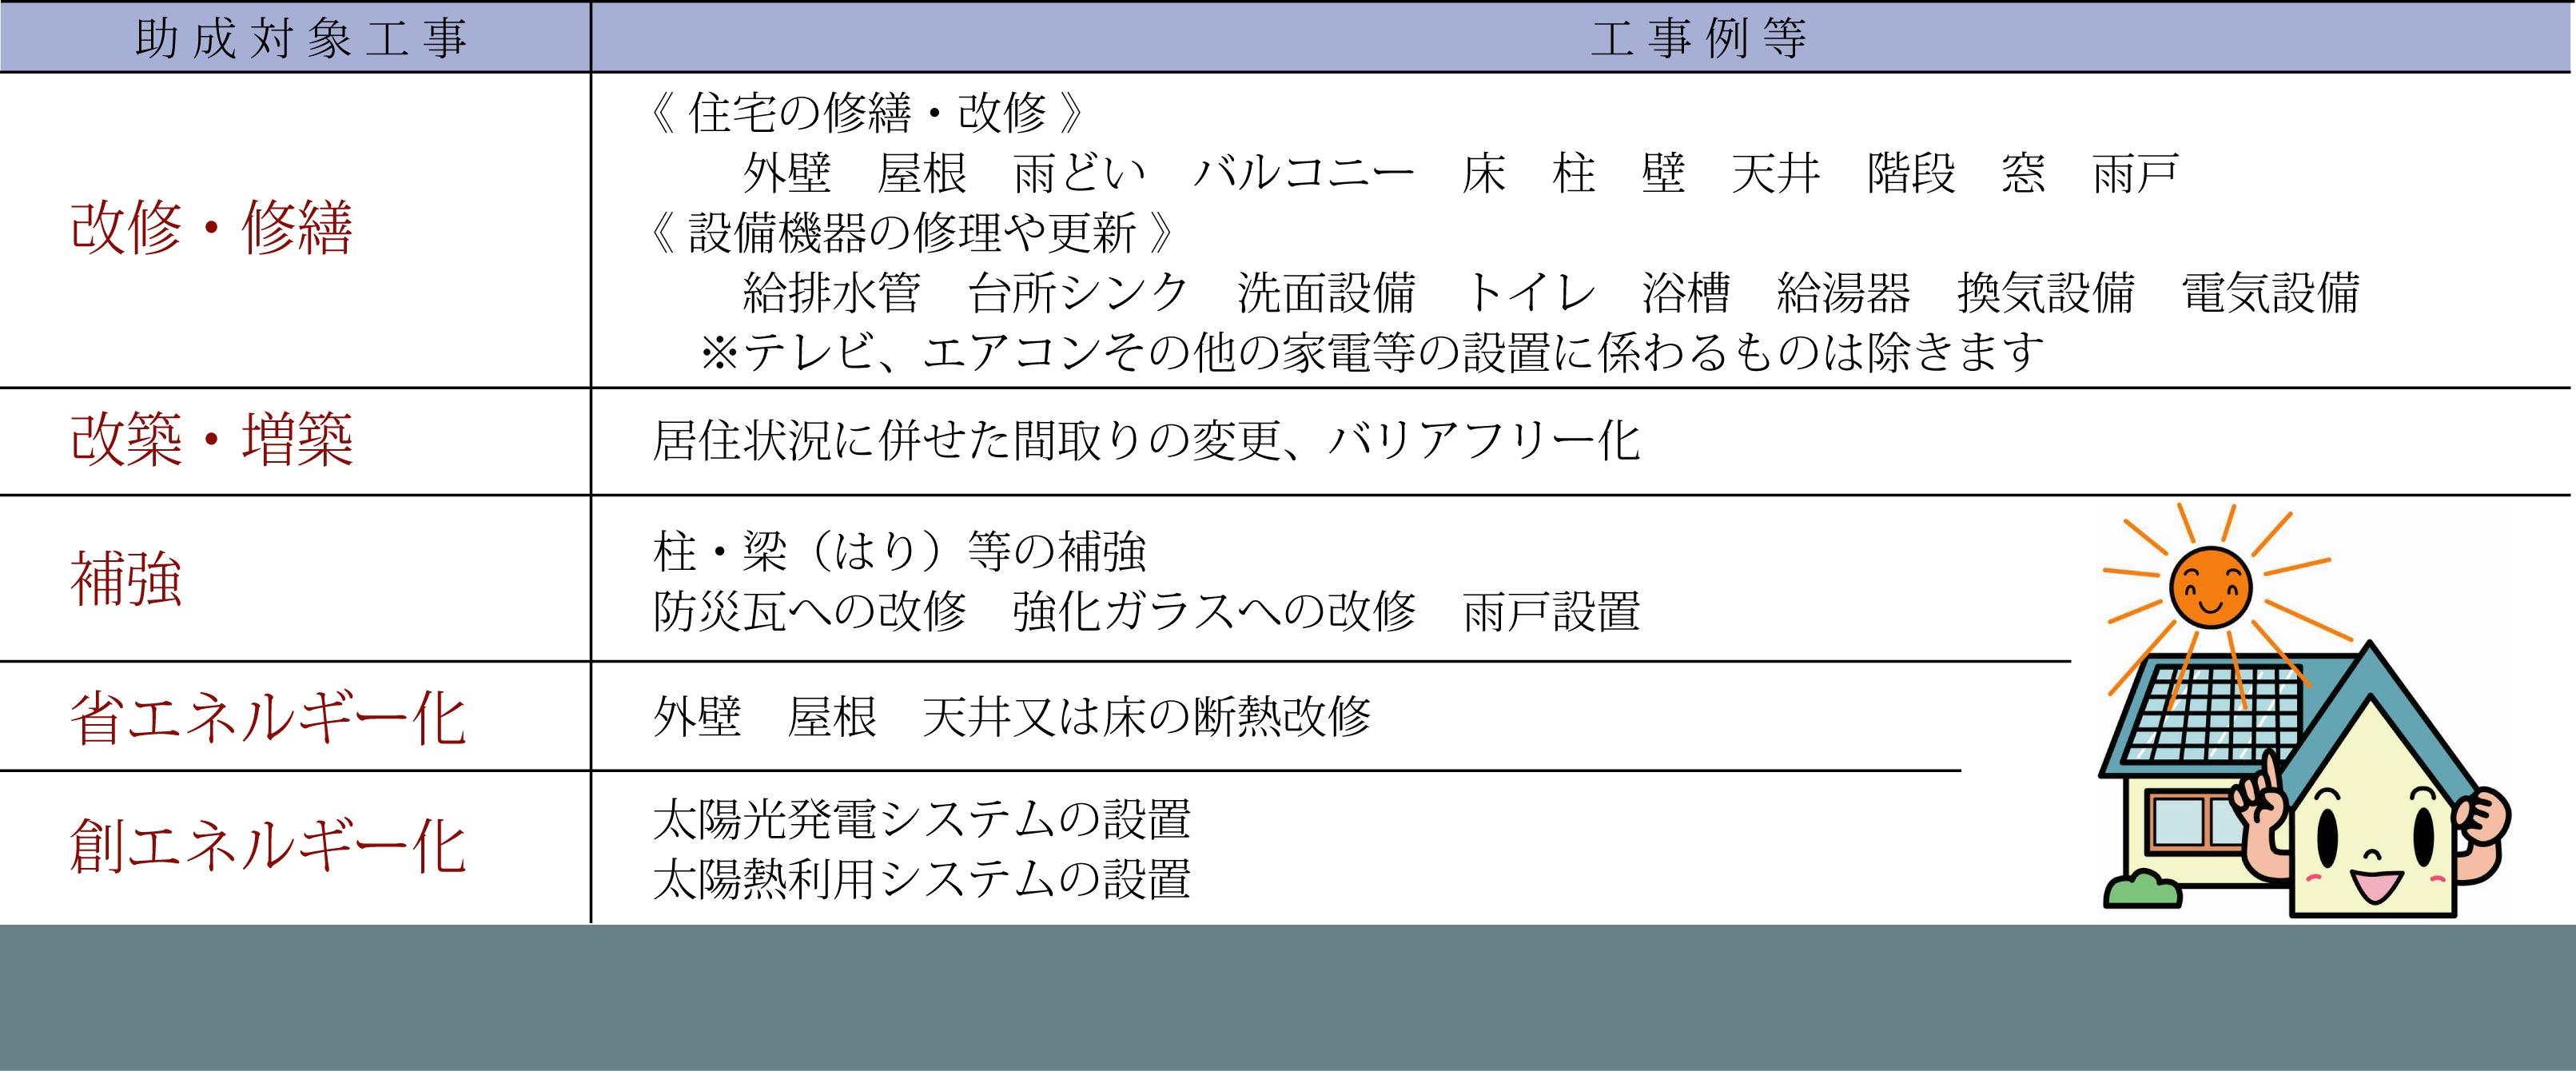 KuraSi-natu-sin73-15.jpg